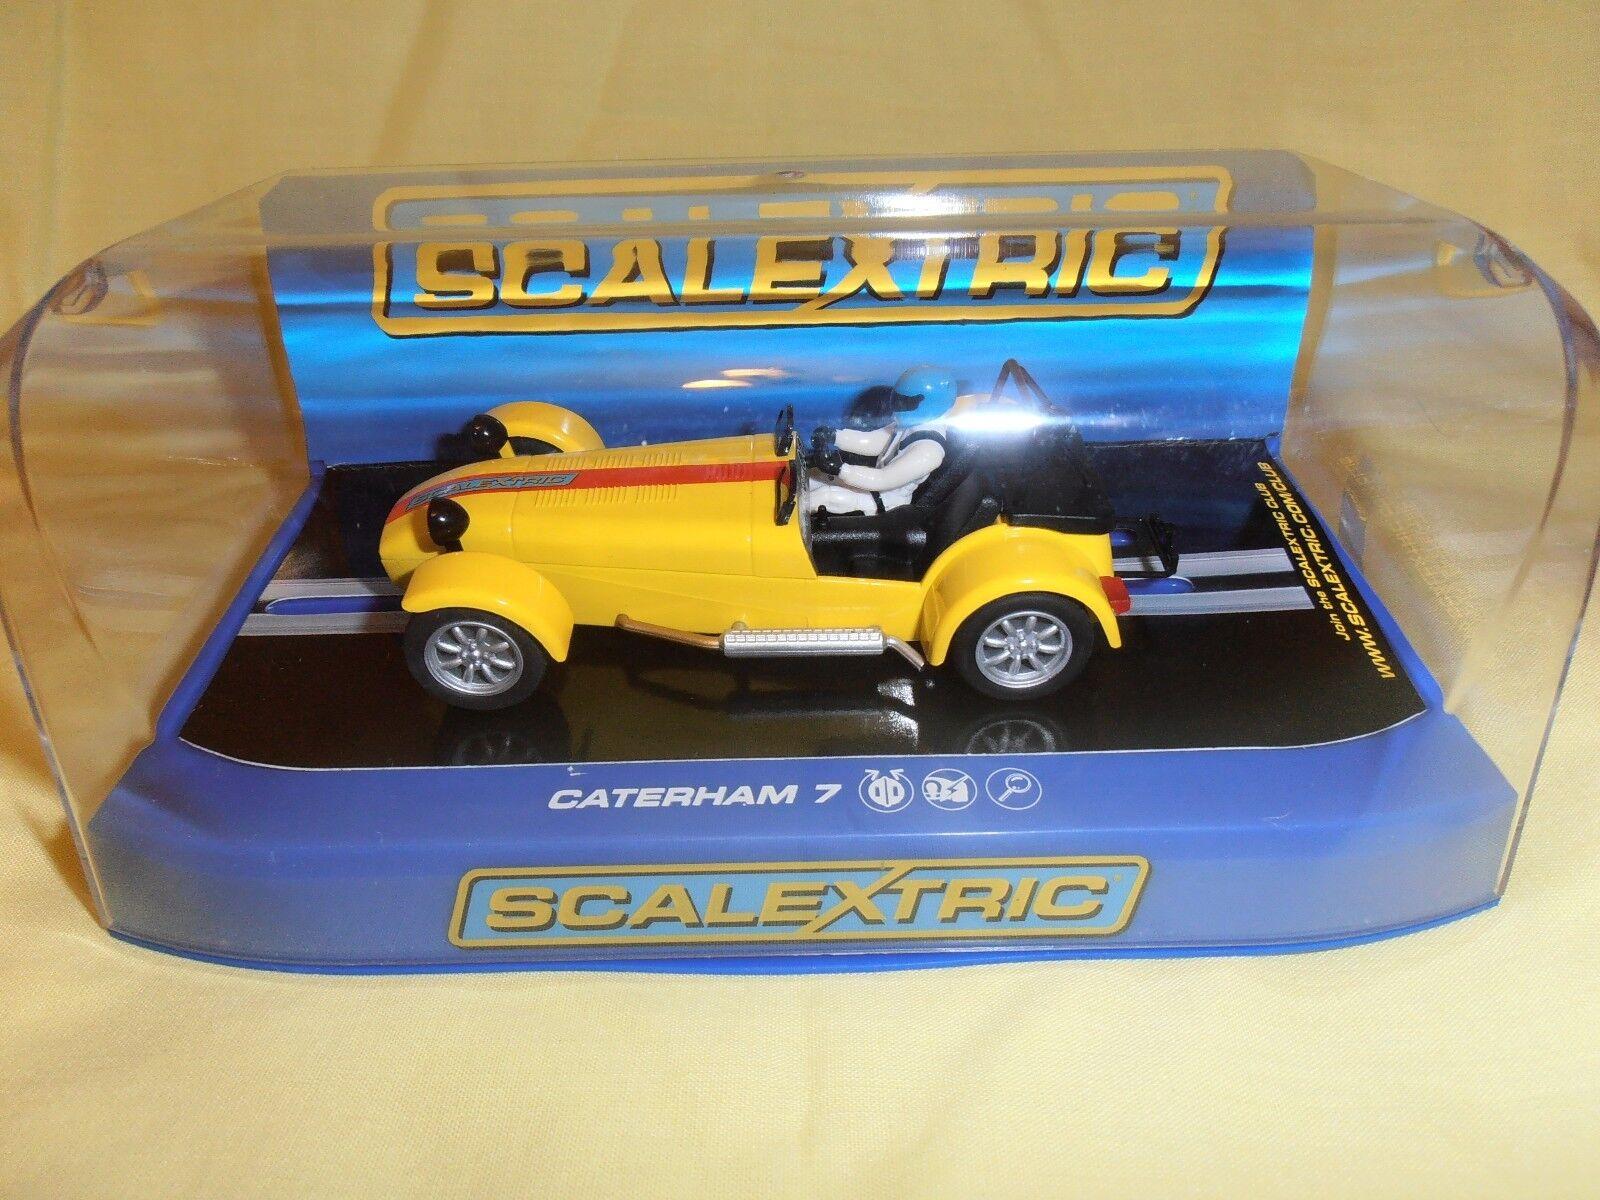 SCALEXTRIC C3425 Caterham 7 Collector Centre Car Ltd Edition of 1500 ninco scx